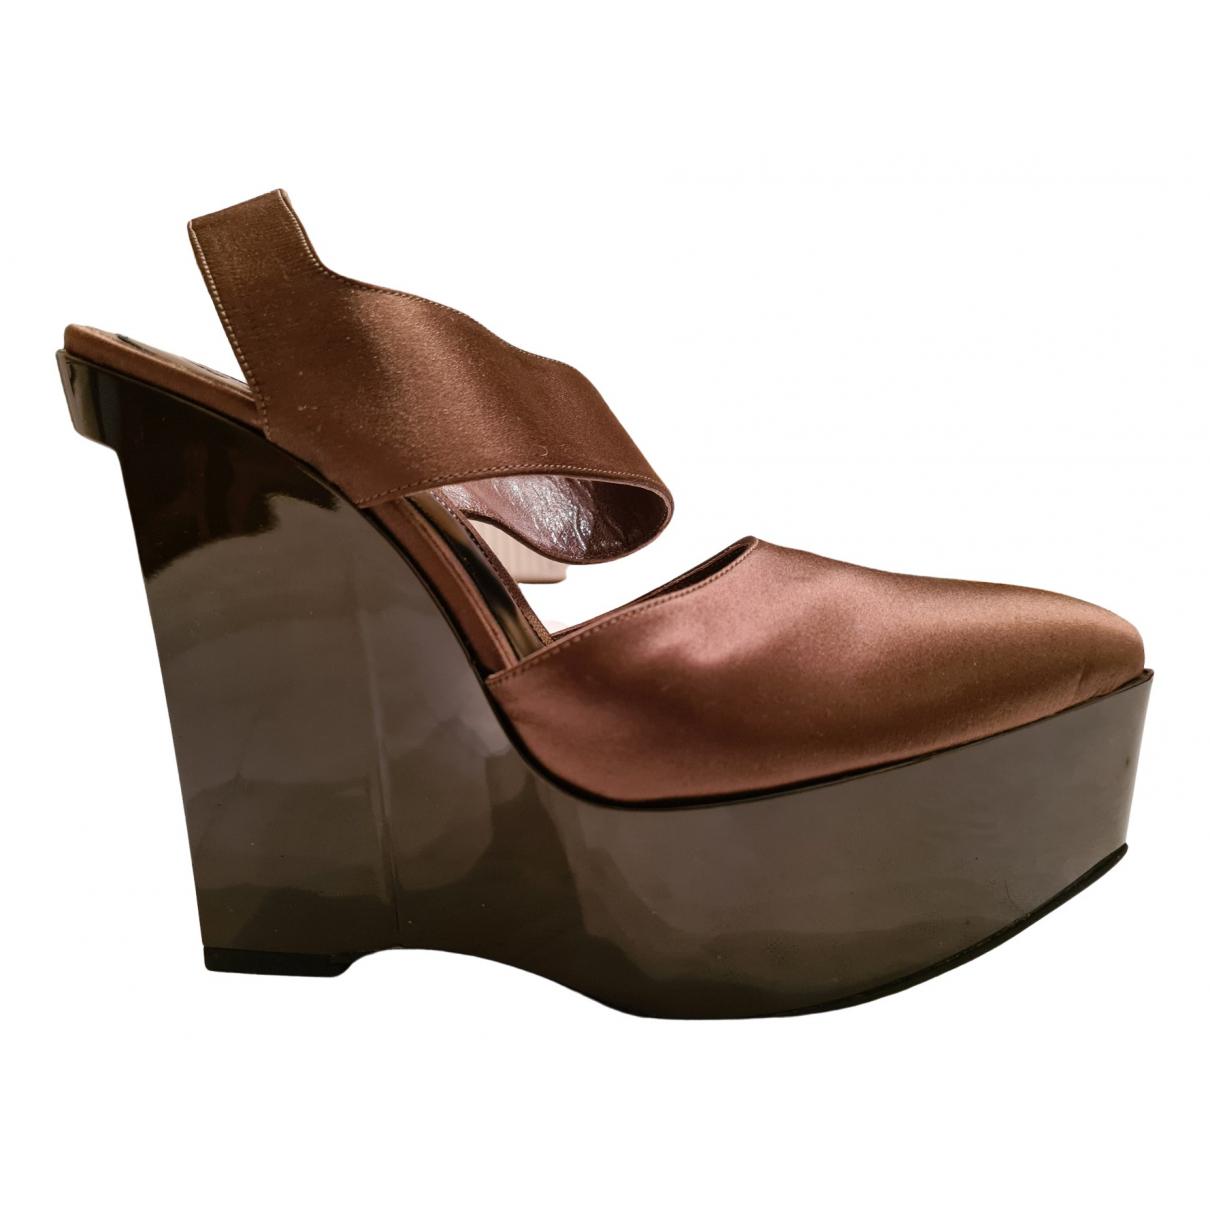 Marni \N Sandalen in  Braun Lackleder